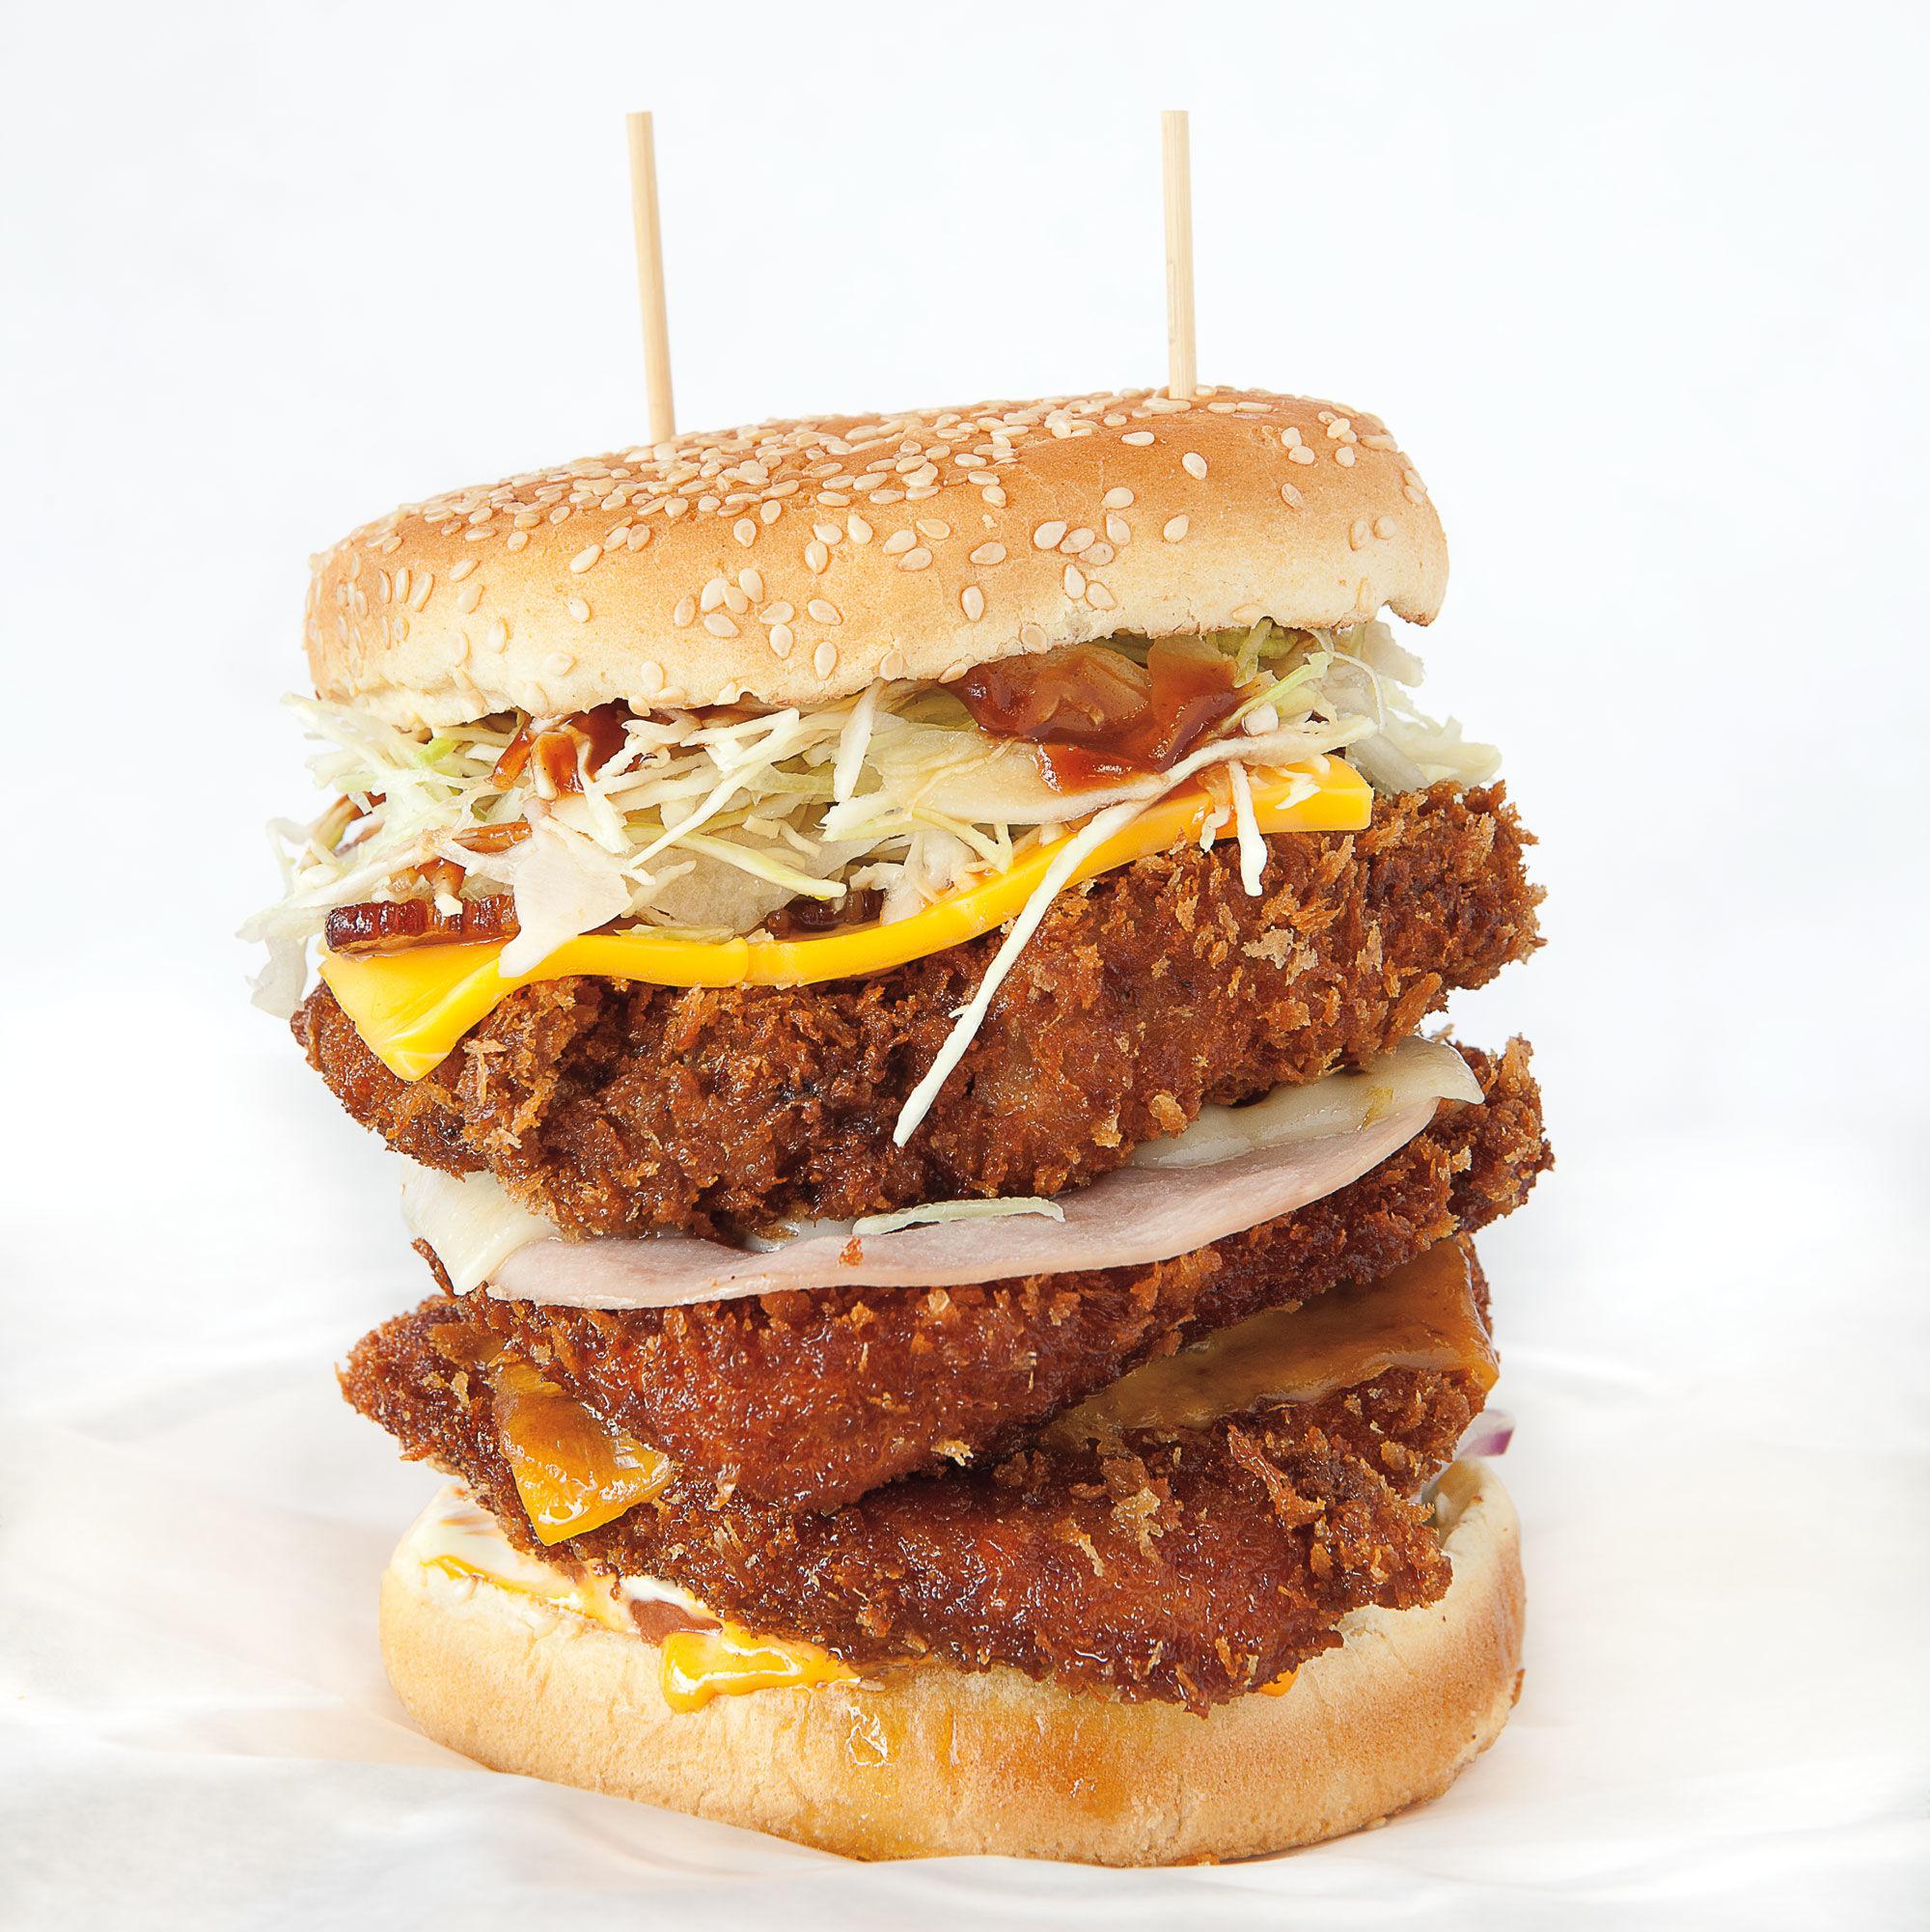 2011.12.19.seattlemet.katsuburger ork1tl